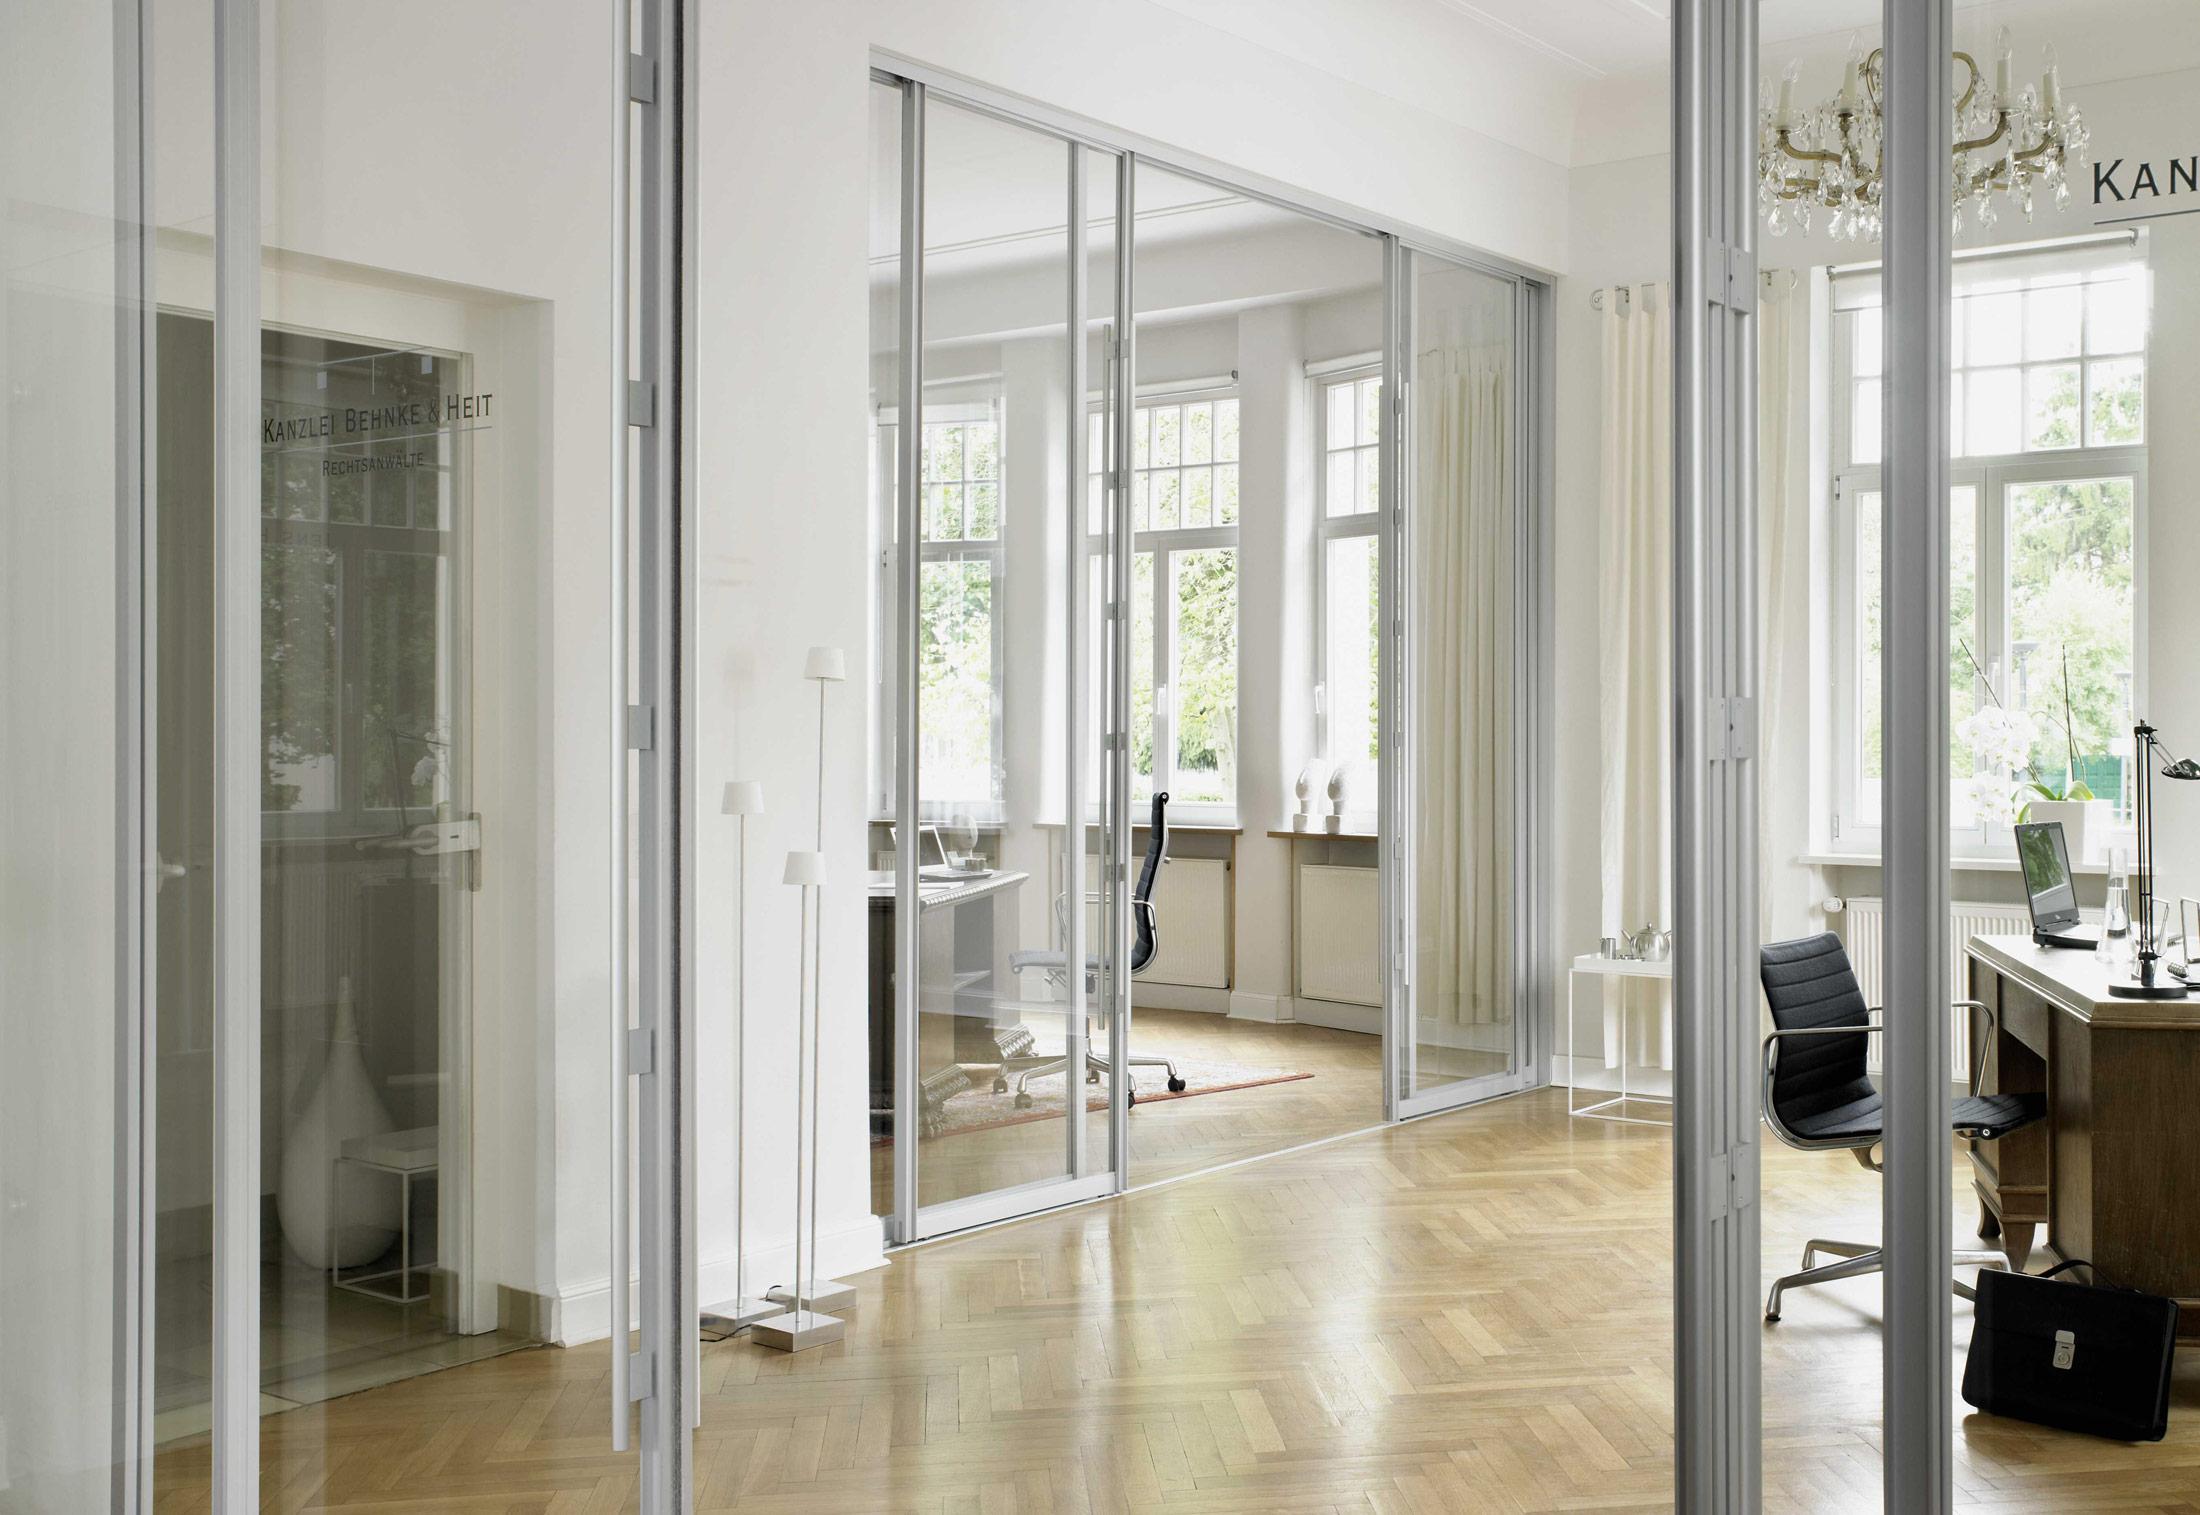 wall partitioning sytem s1500 sliding door system wood door by raumplus stylepark. Black Bedroom Furniture Sets. Home Design Ideas